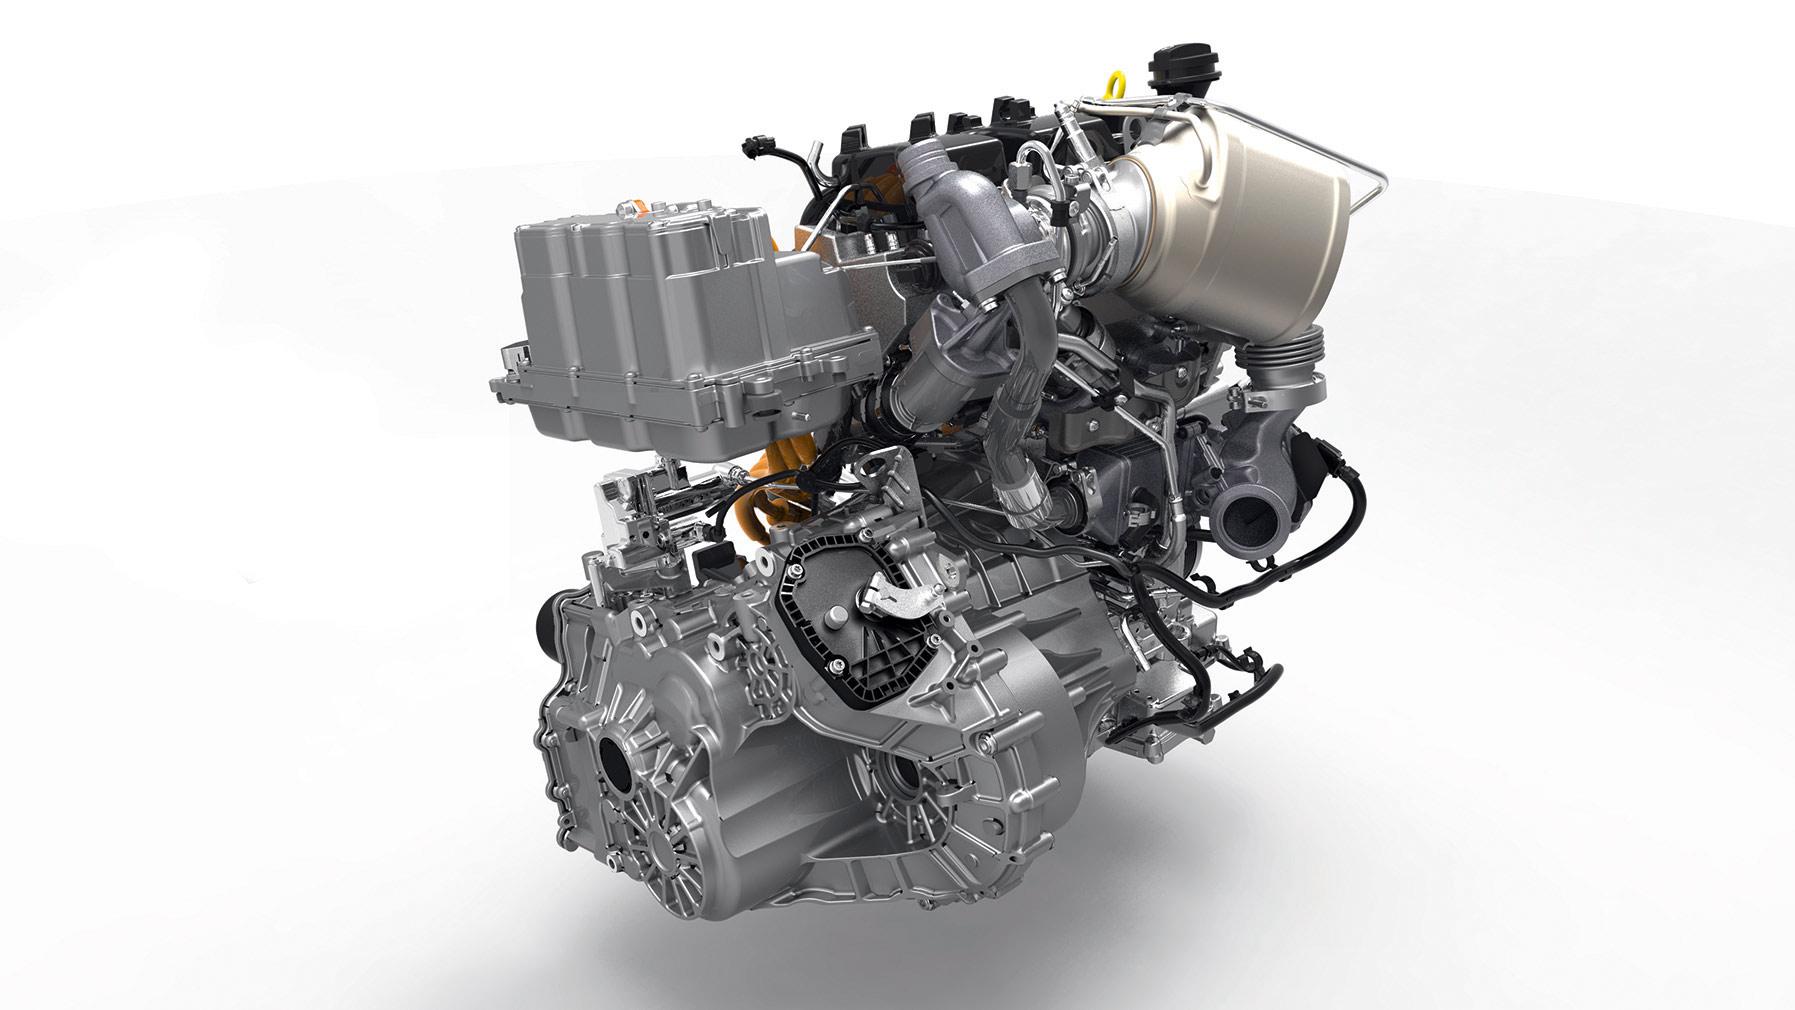 Audi Q5 test mule 301 600x300 photo